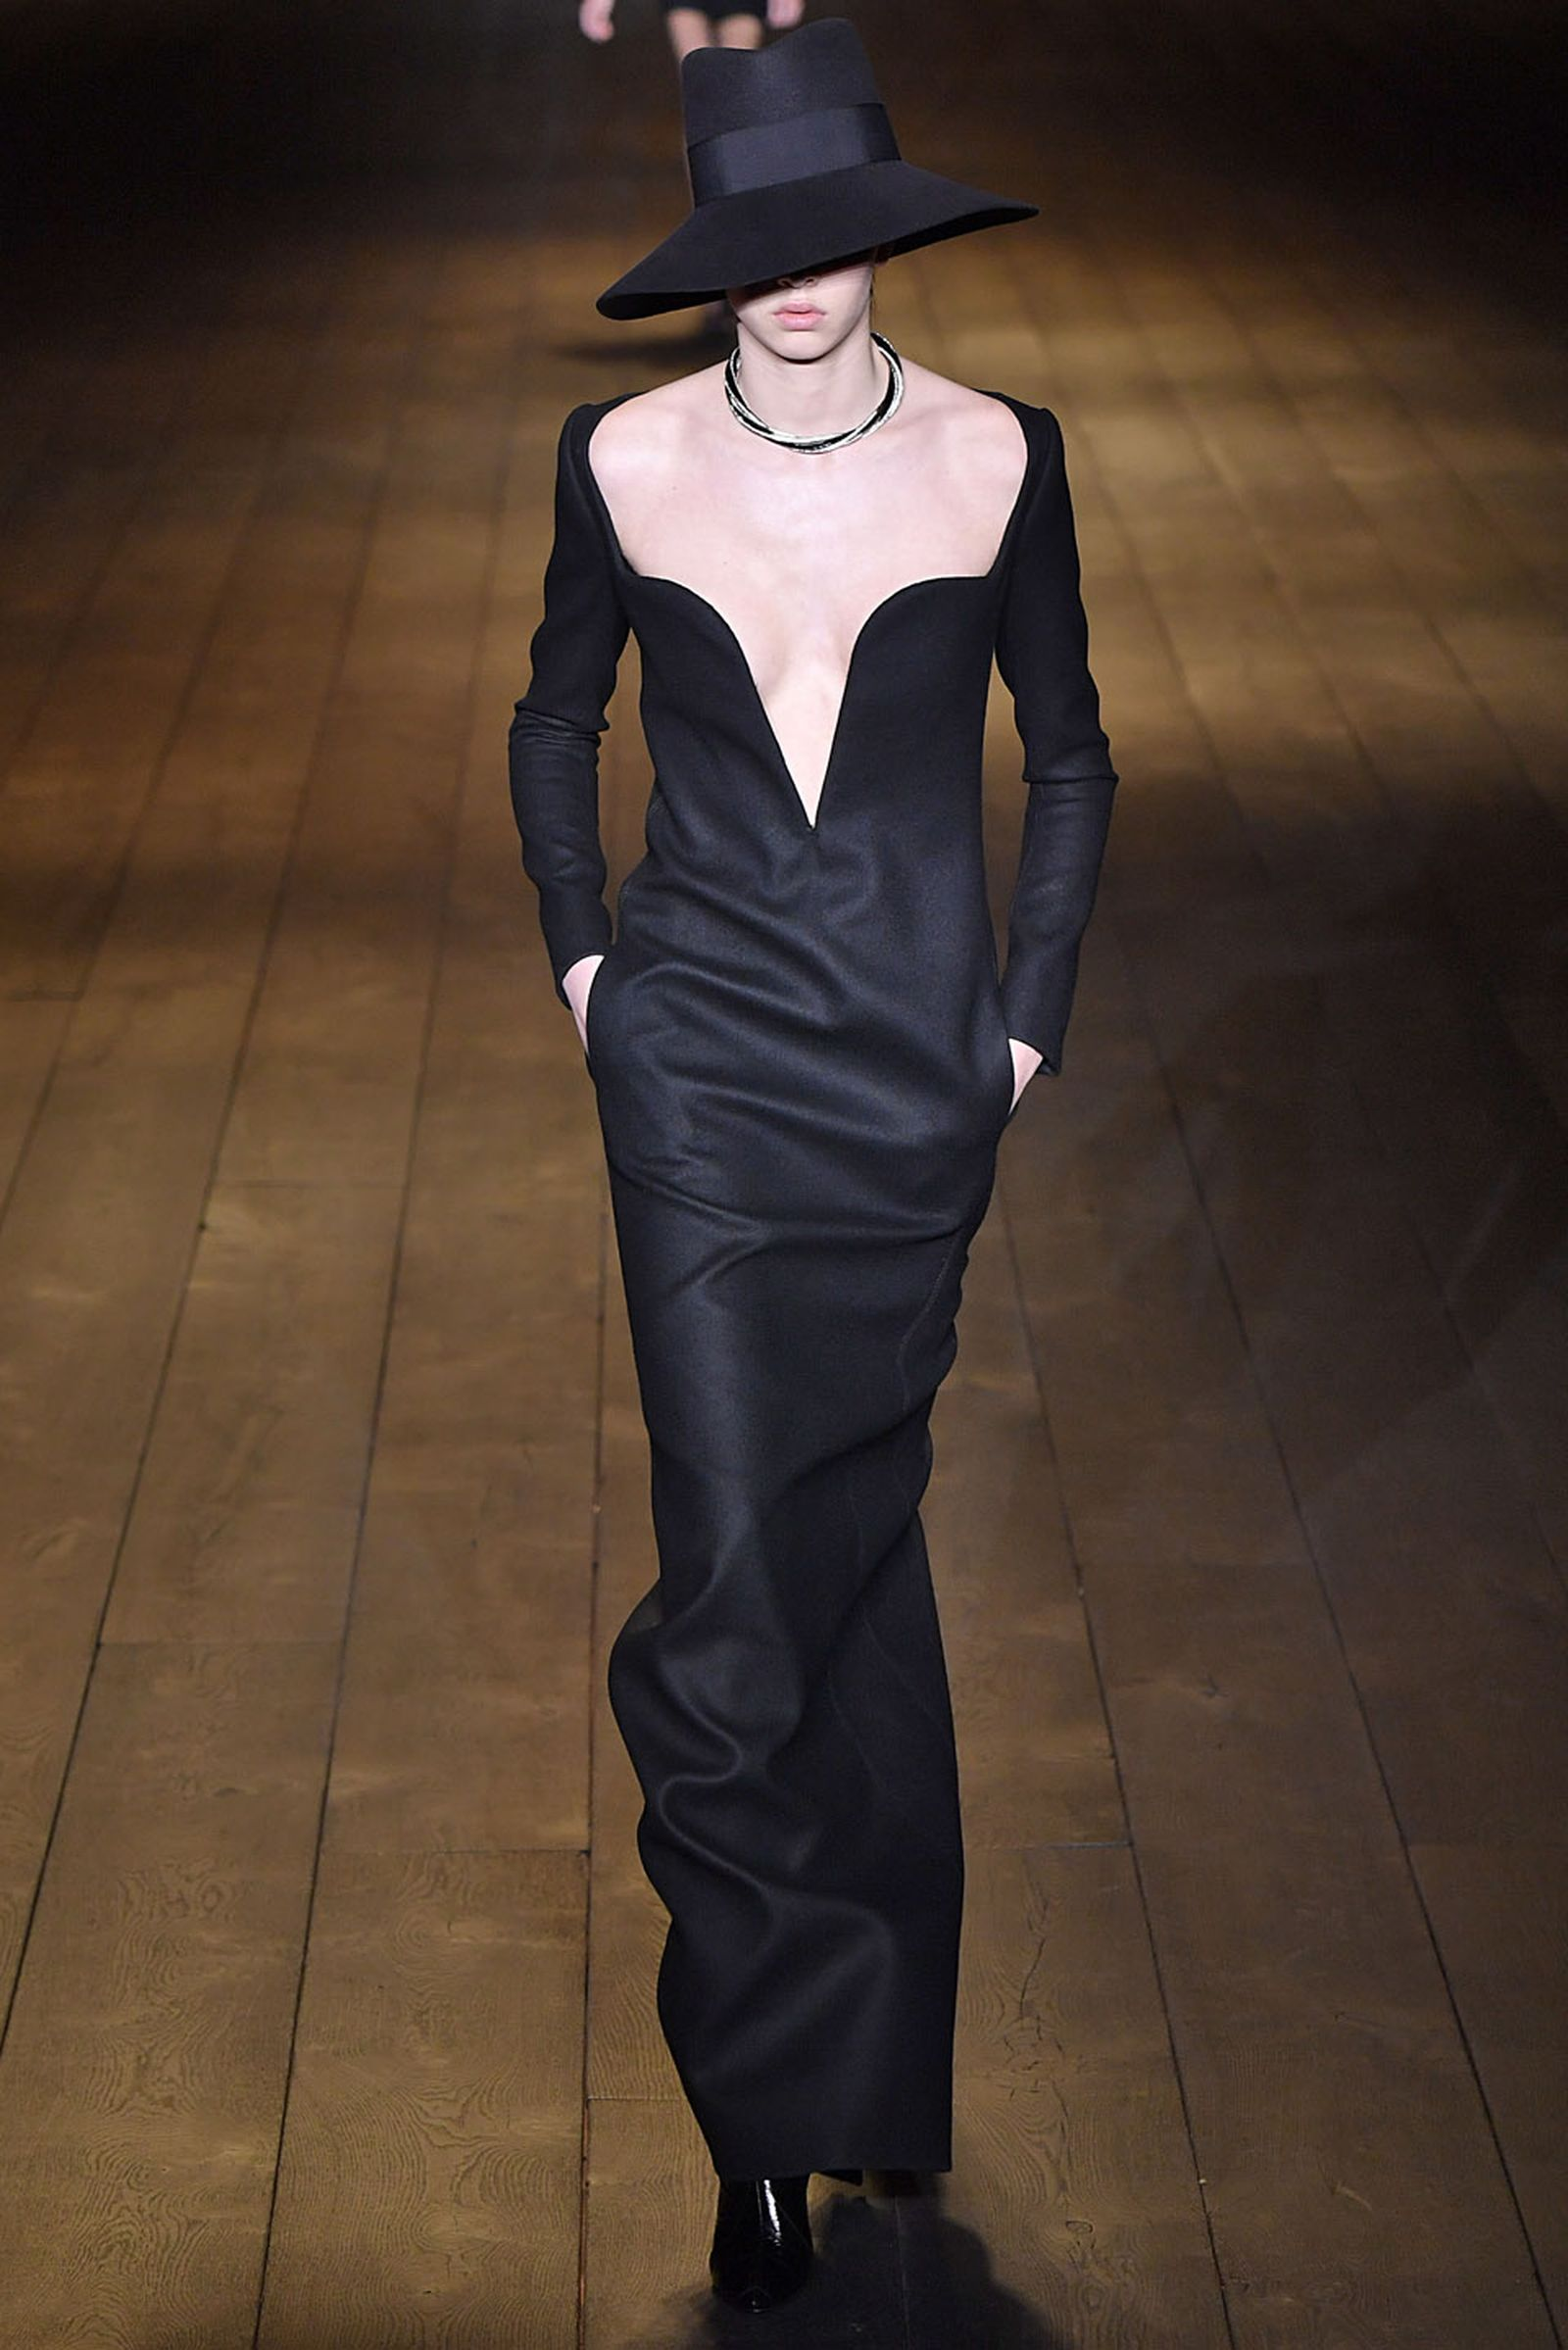 Saint Laurent : Runway Paris Fashion Week Womenswear Fall/Winter 2018/2019 Fw18